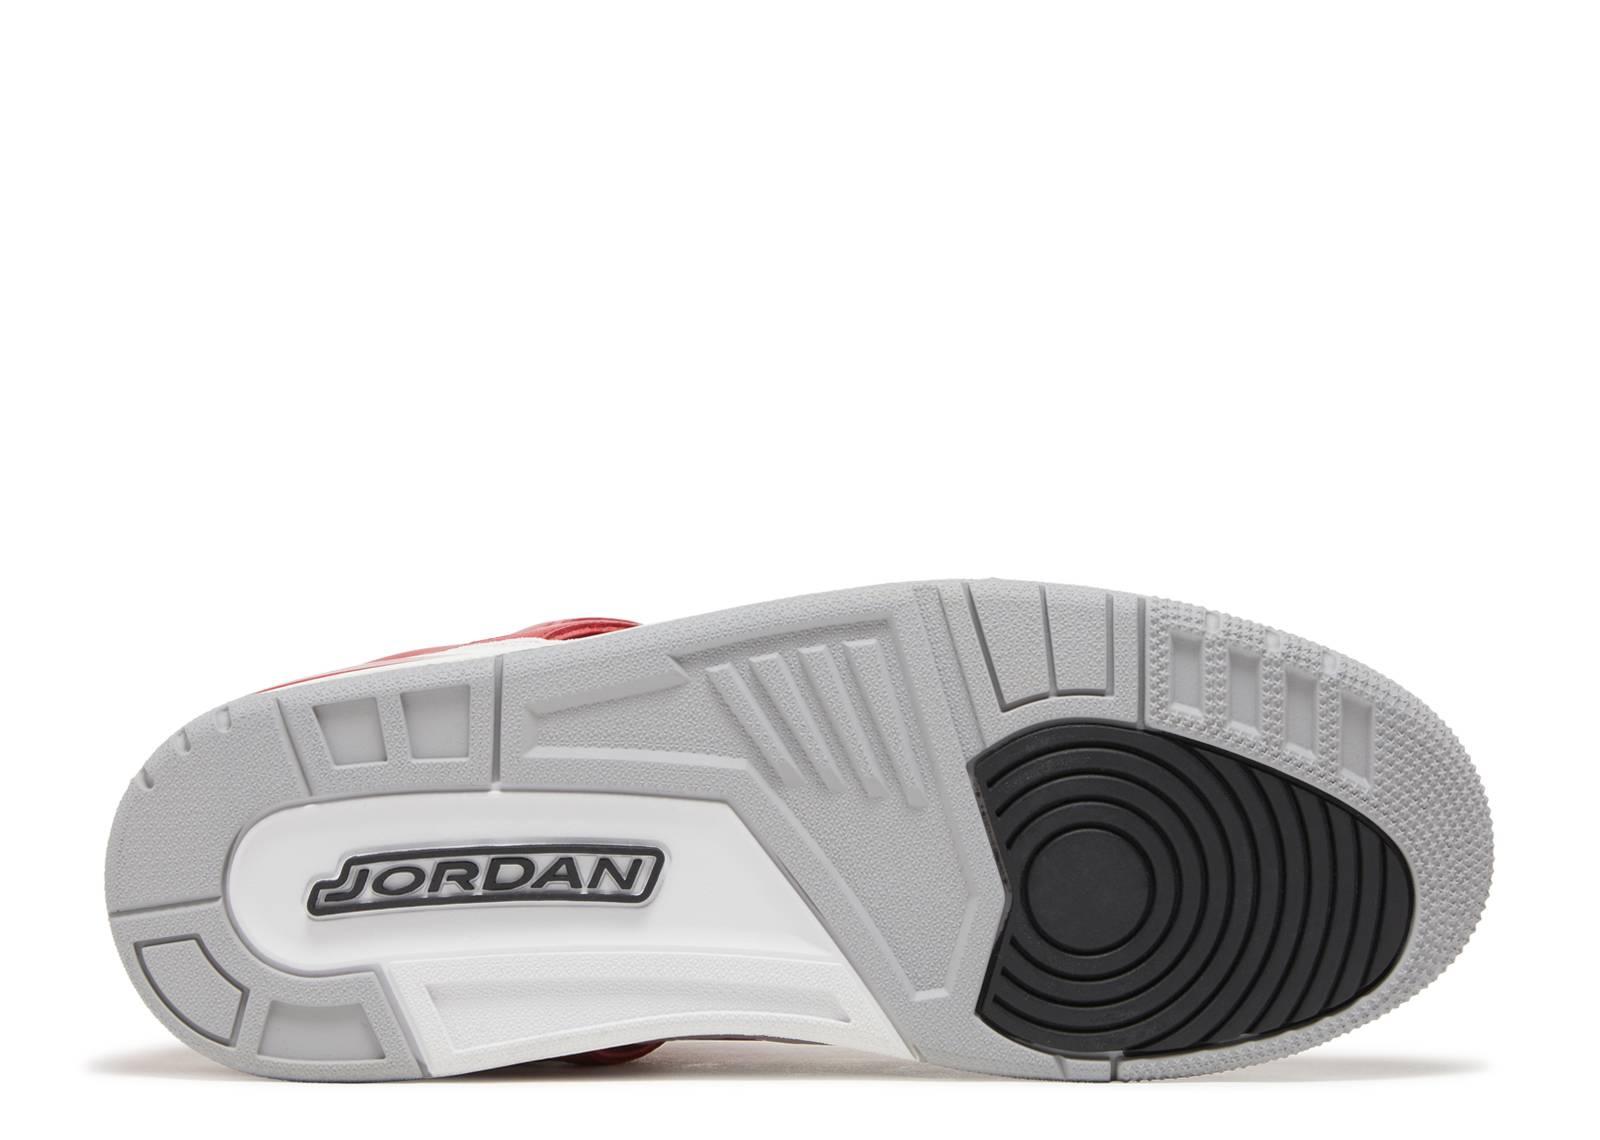 5a59241416d Jordan Spizike - Air Jordan - 315371 603 - gym red black-white-wolf grey